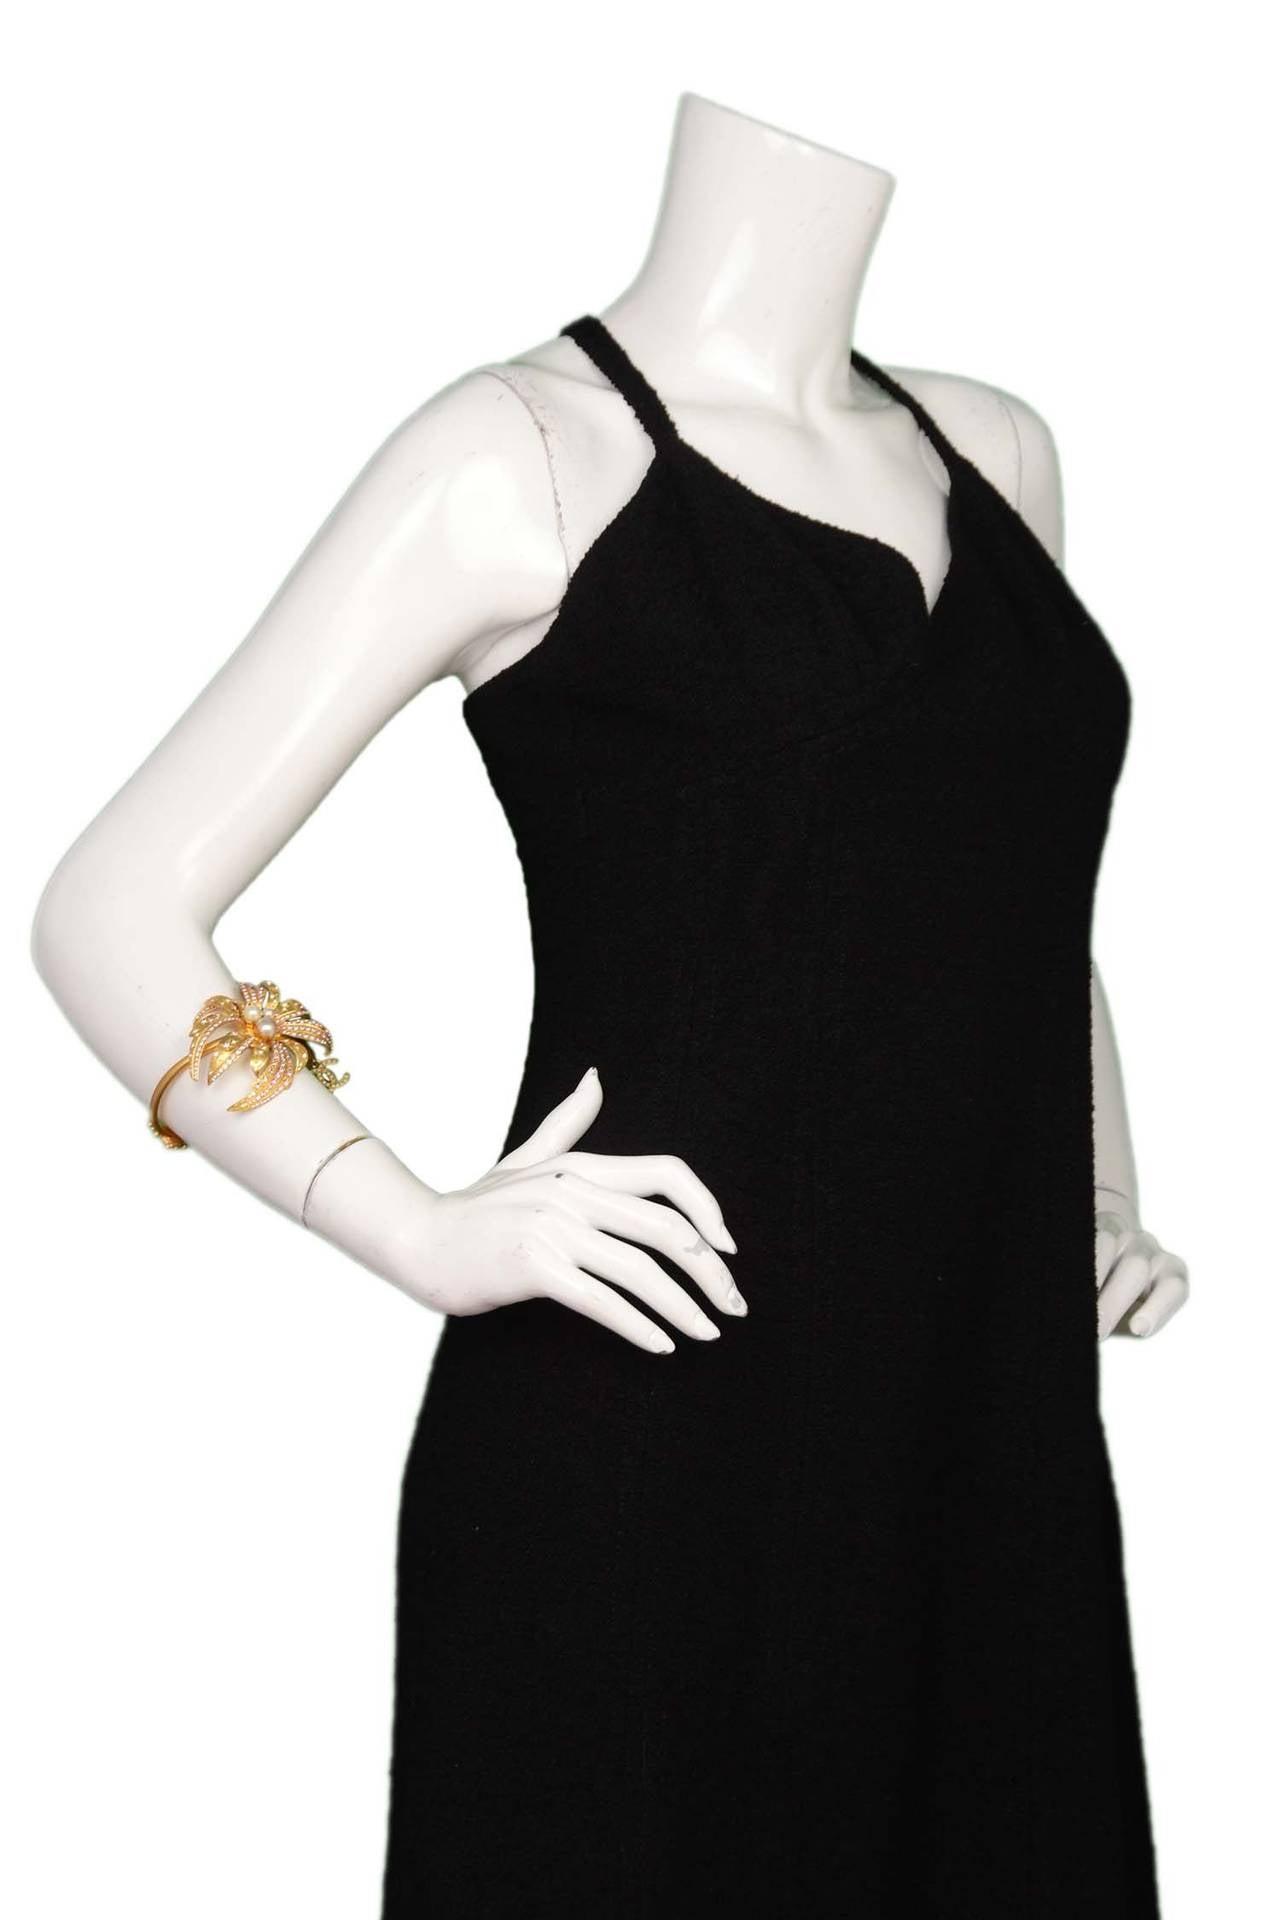 CHANEL 2002 Gold Bracelet w/Pink Rhinestone Flower & Pearls 6